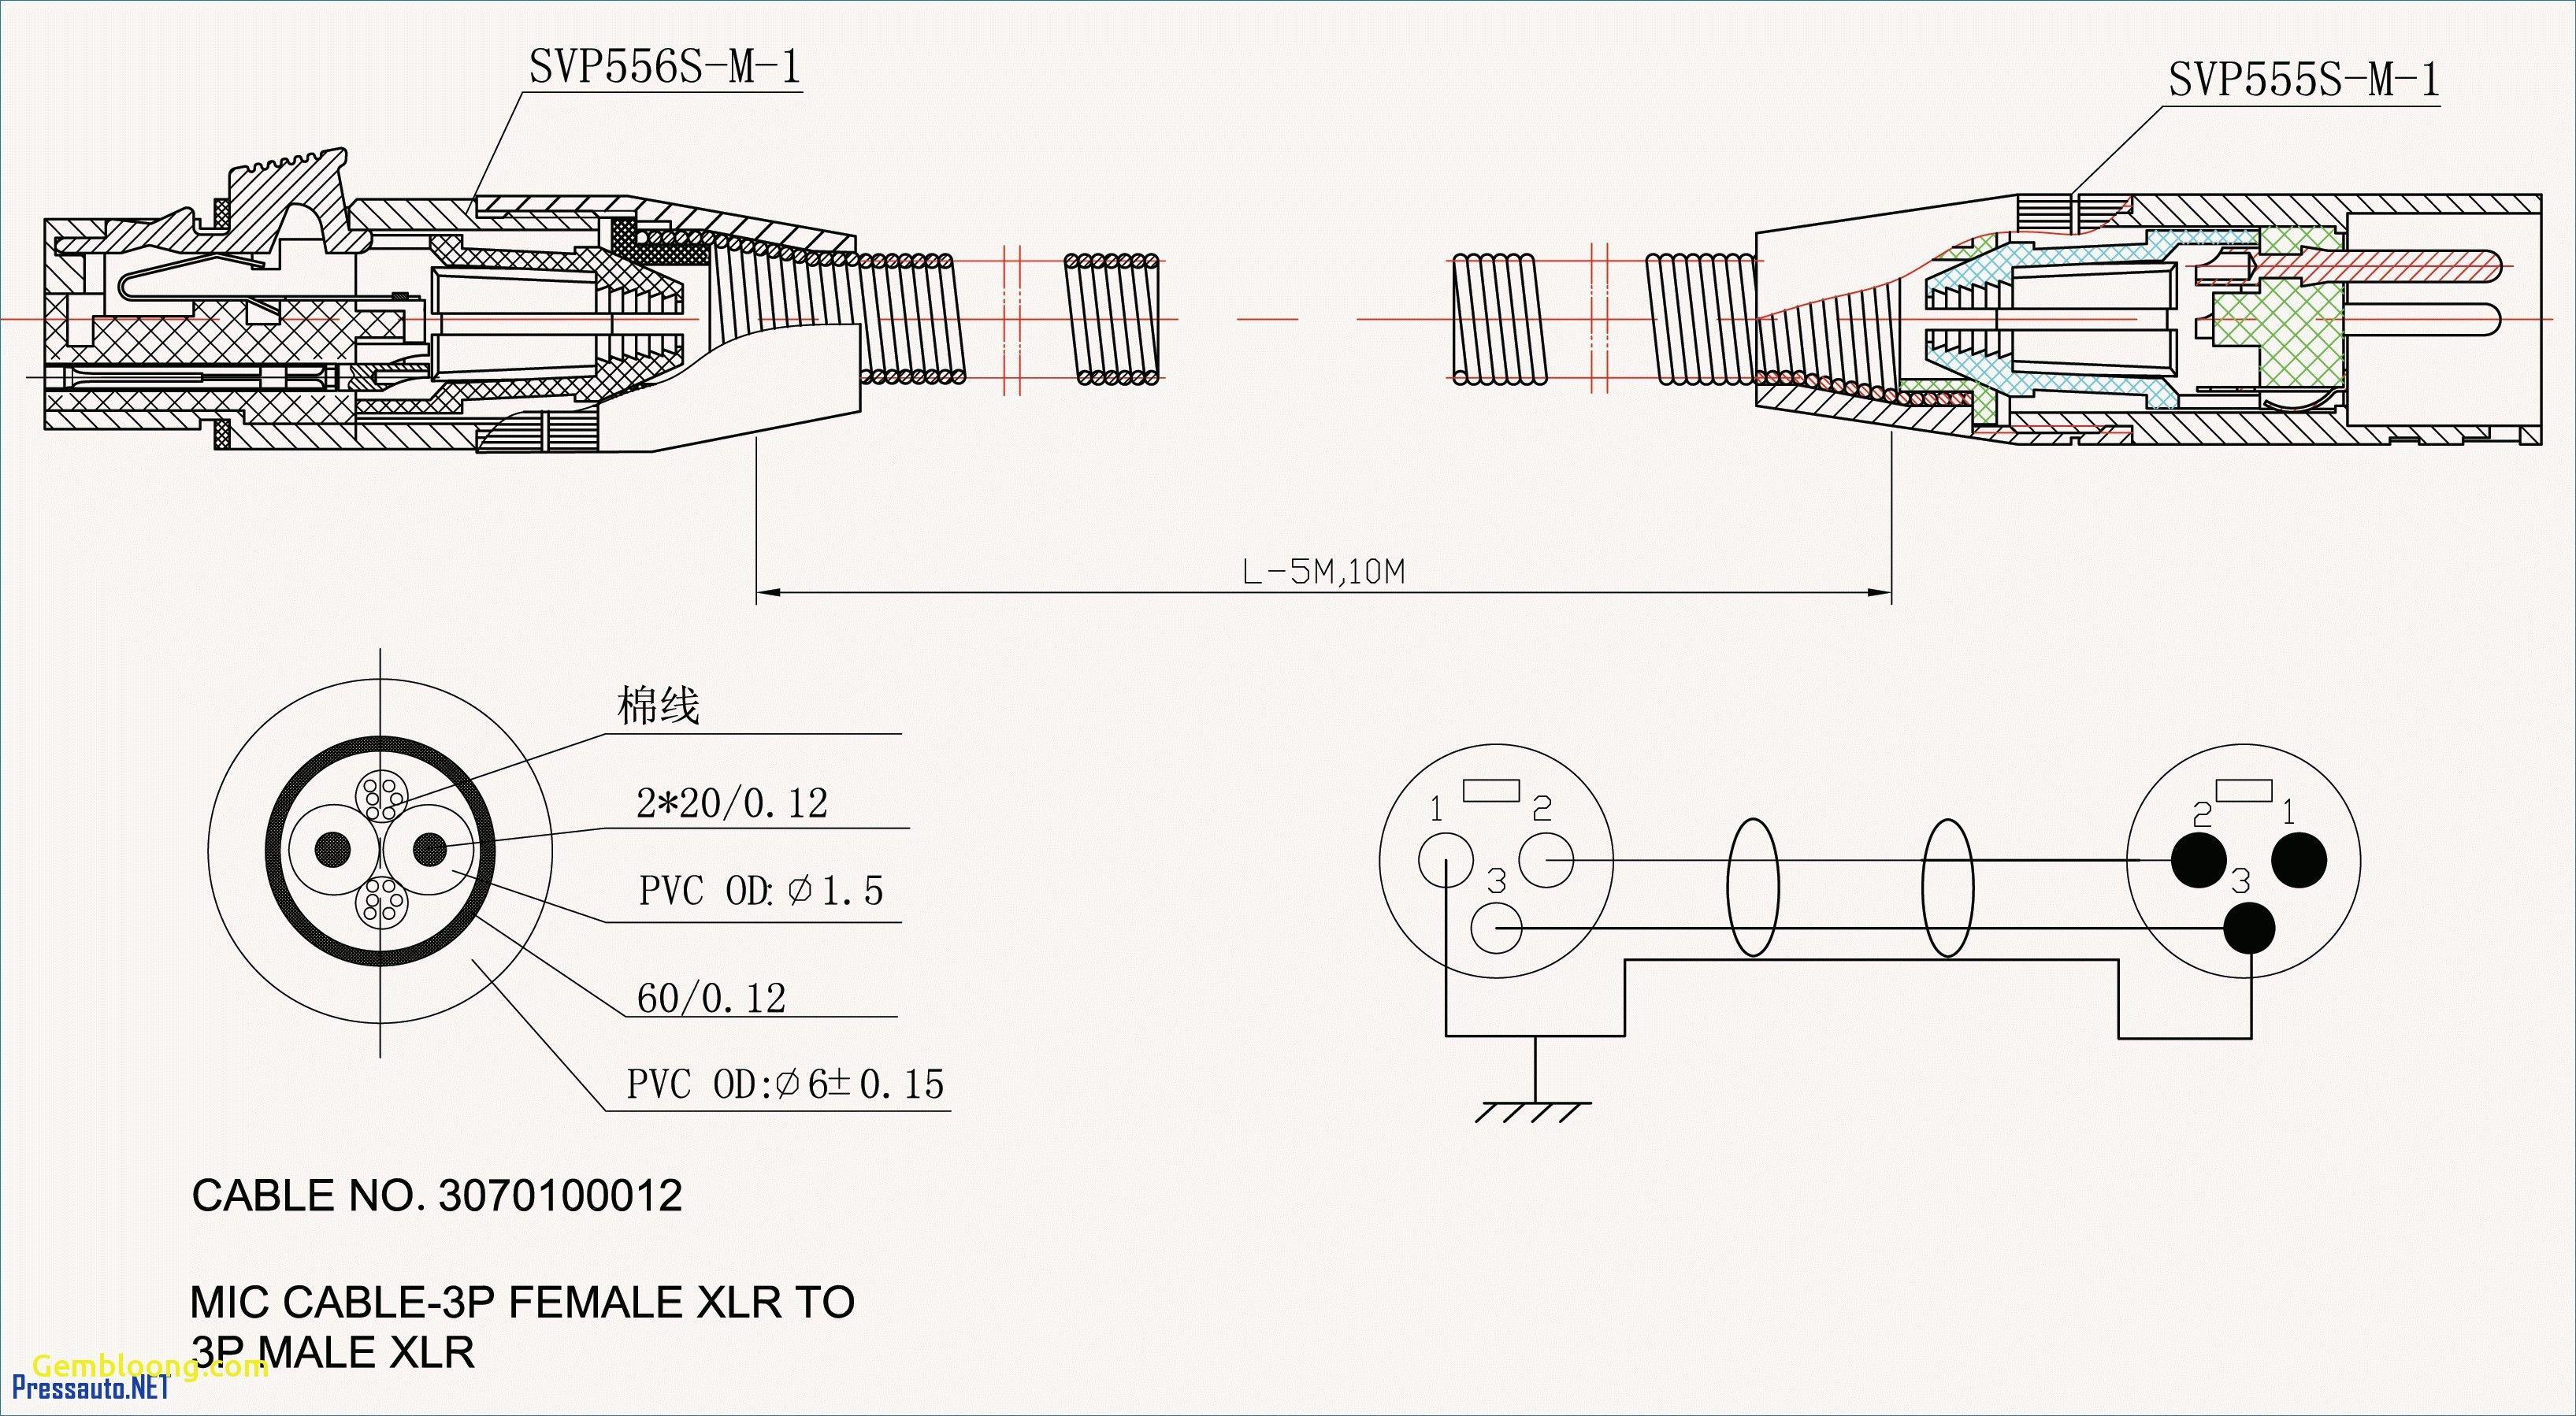 7 3 Powerstroke Engine Diagram 2 Electrical Wiring Diagram Alternator Diagram